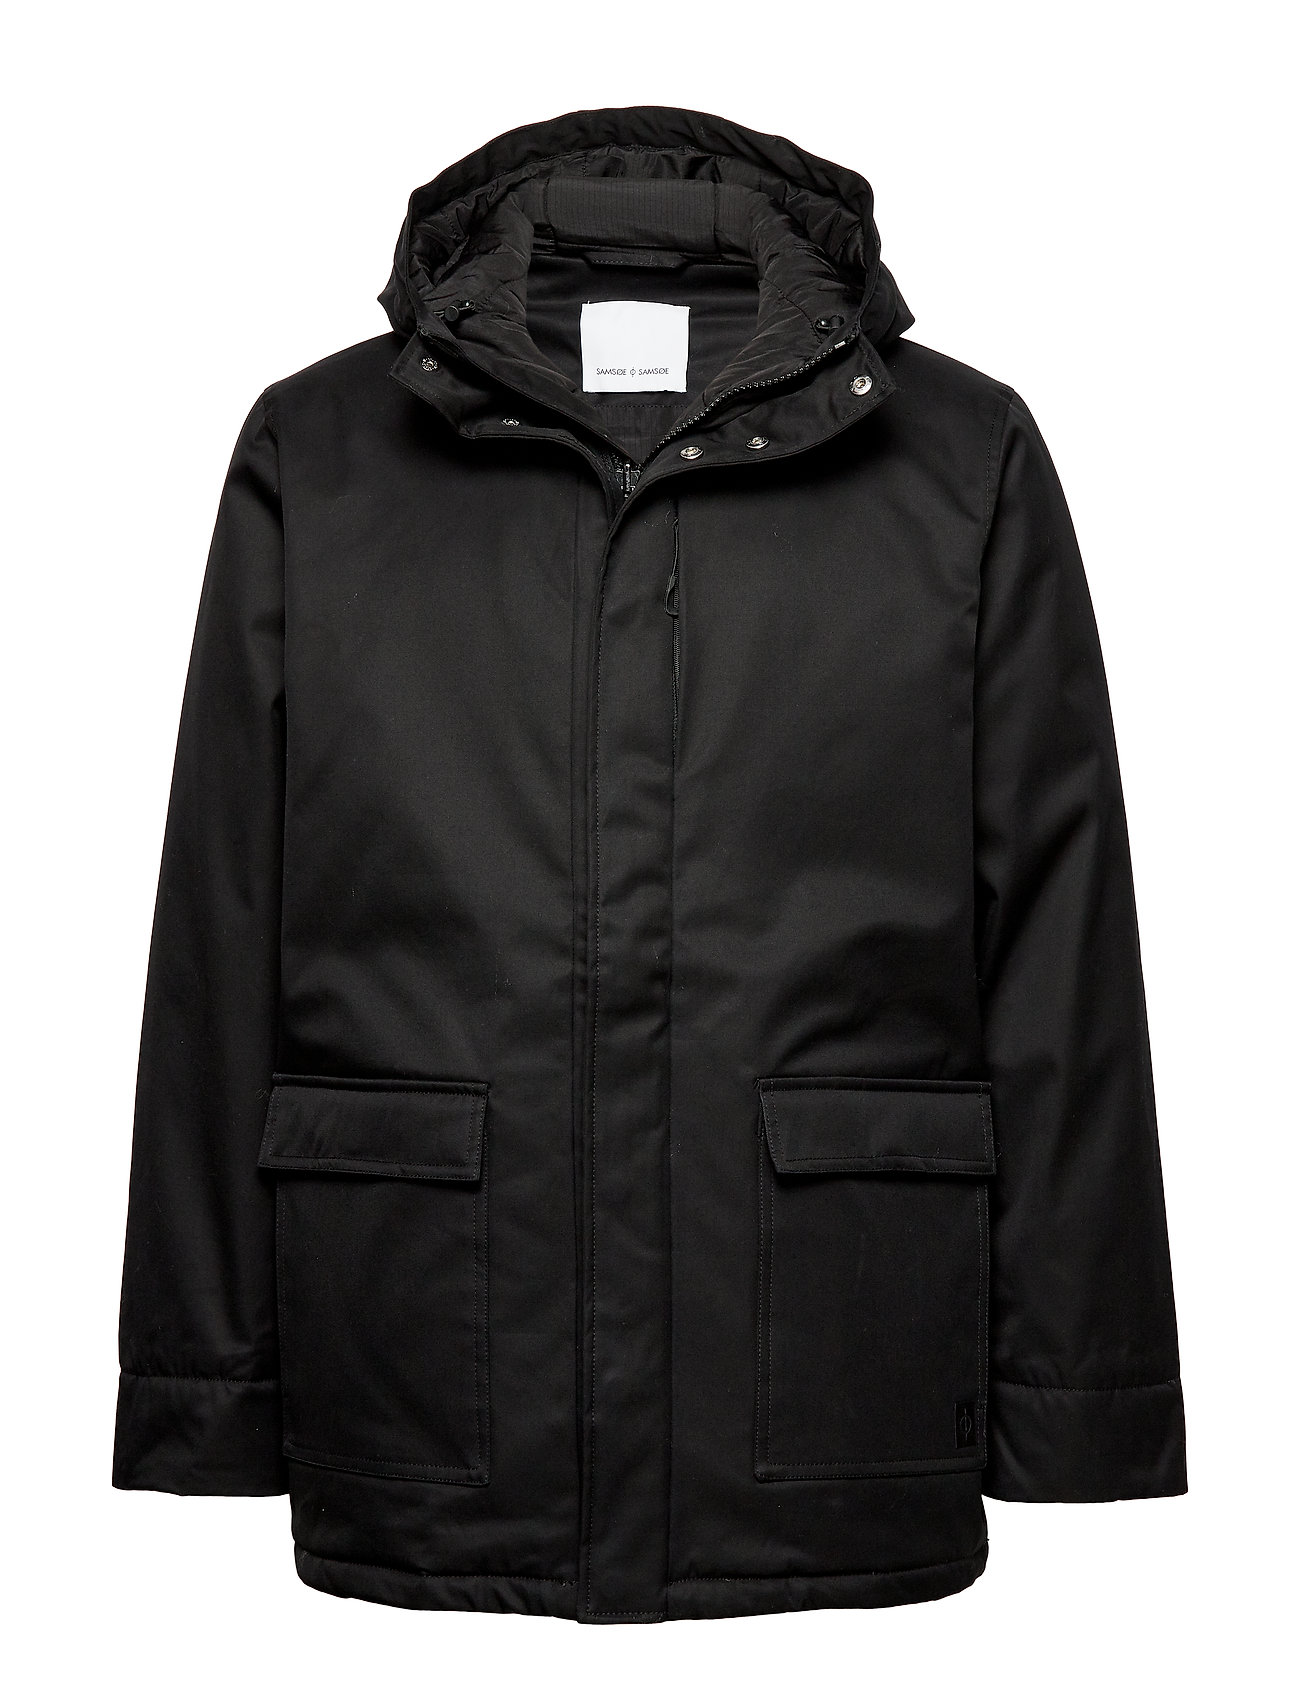 Samsøe & Samsøe Bel jacket 11183 - BLACK